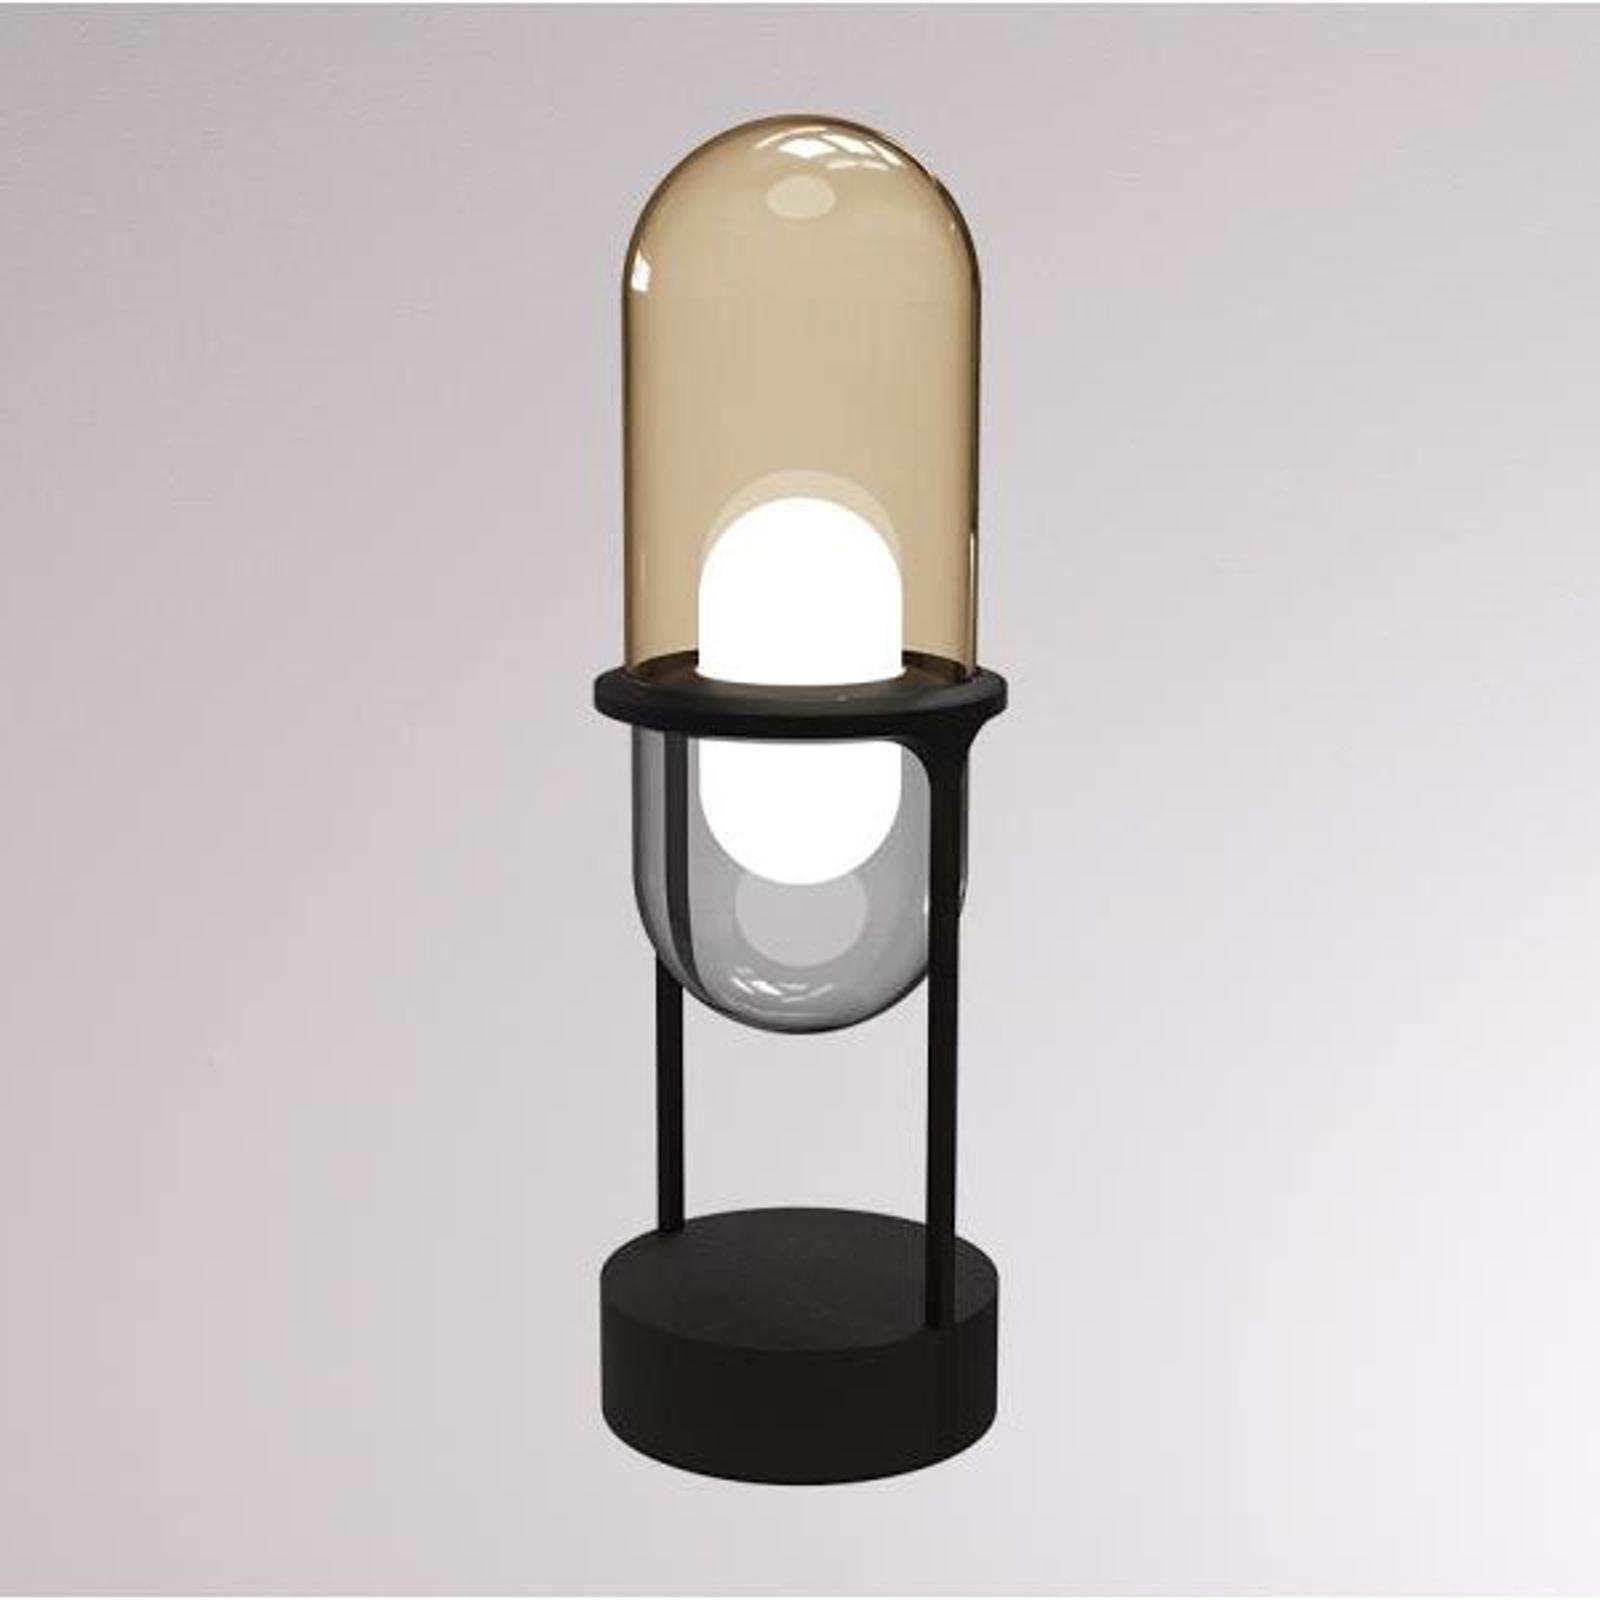 LOUM Pille LED tafellamp champagne/grijs